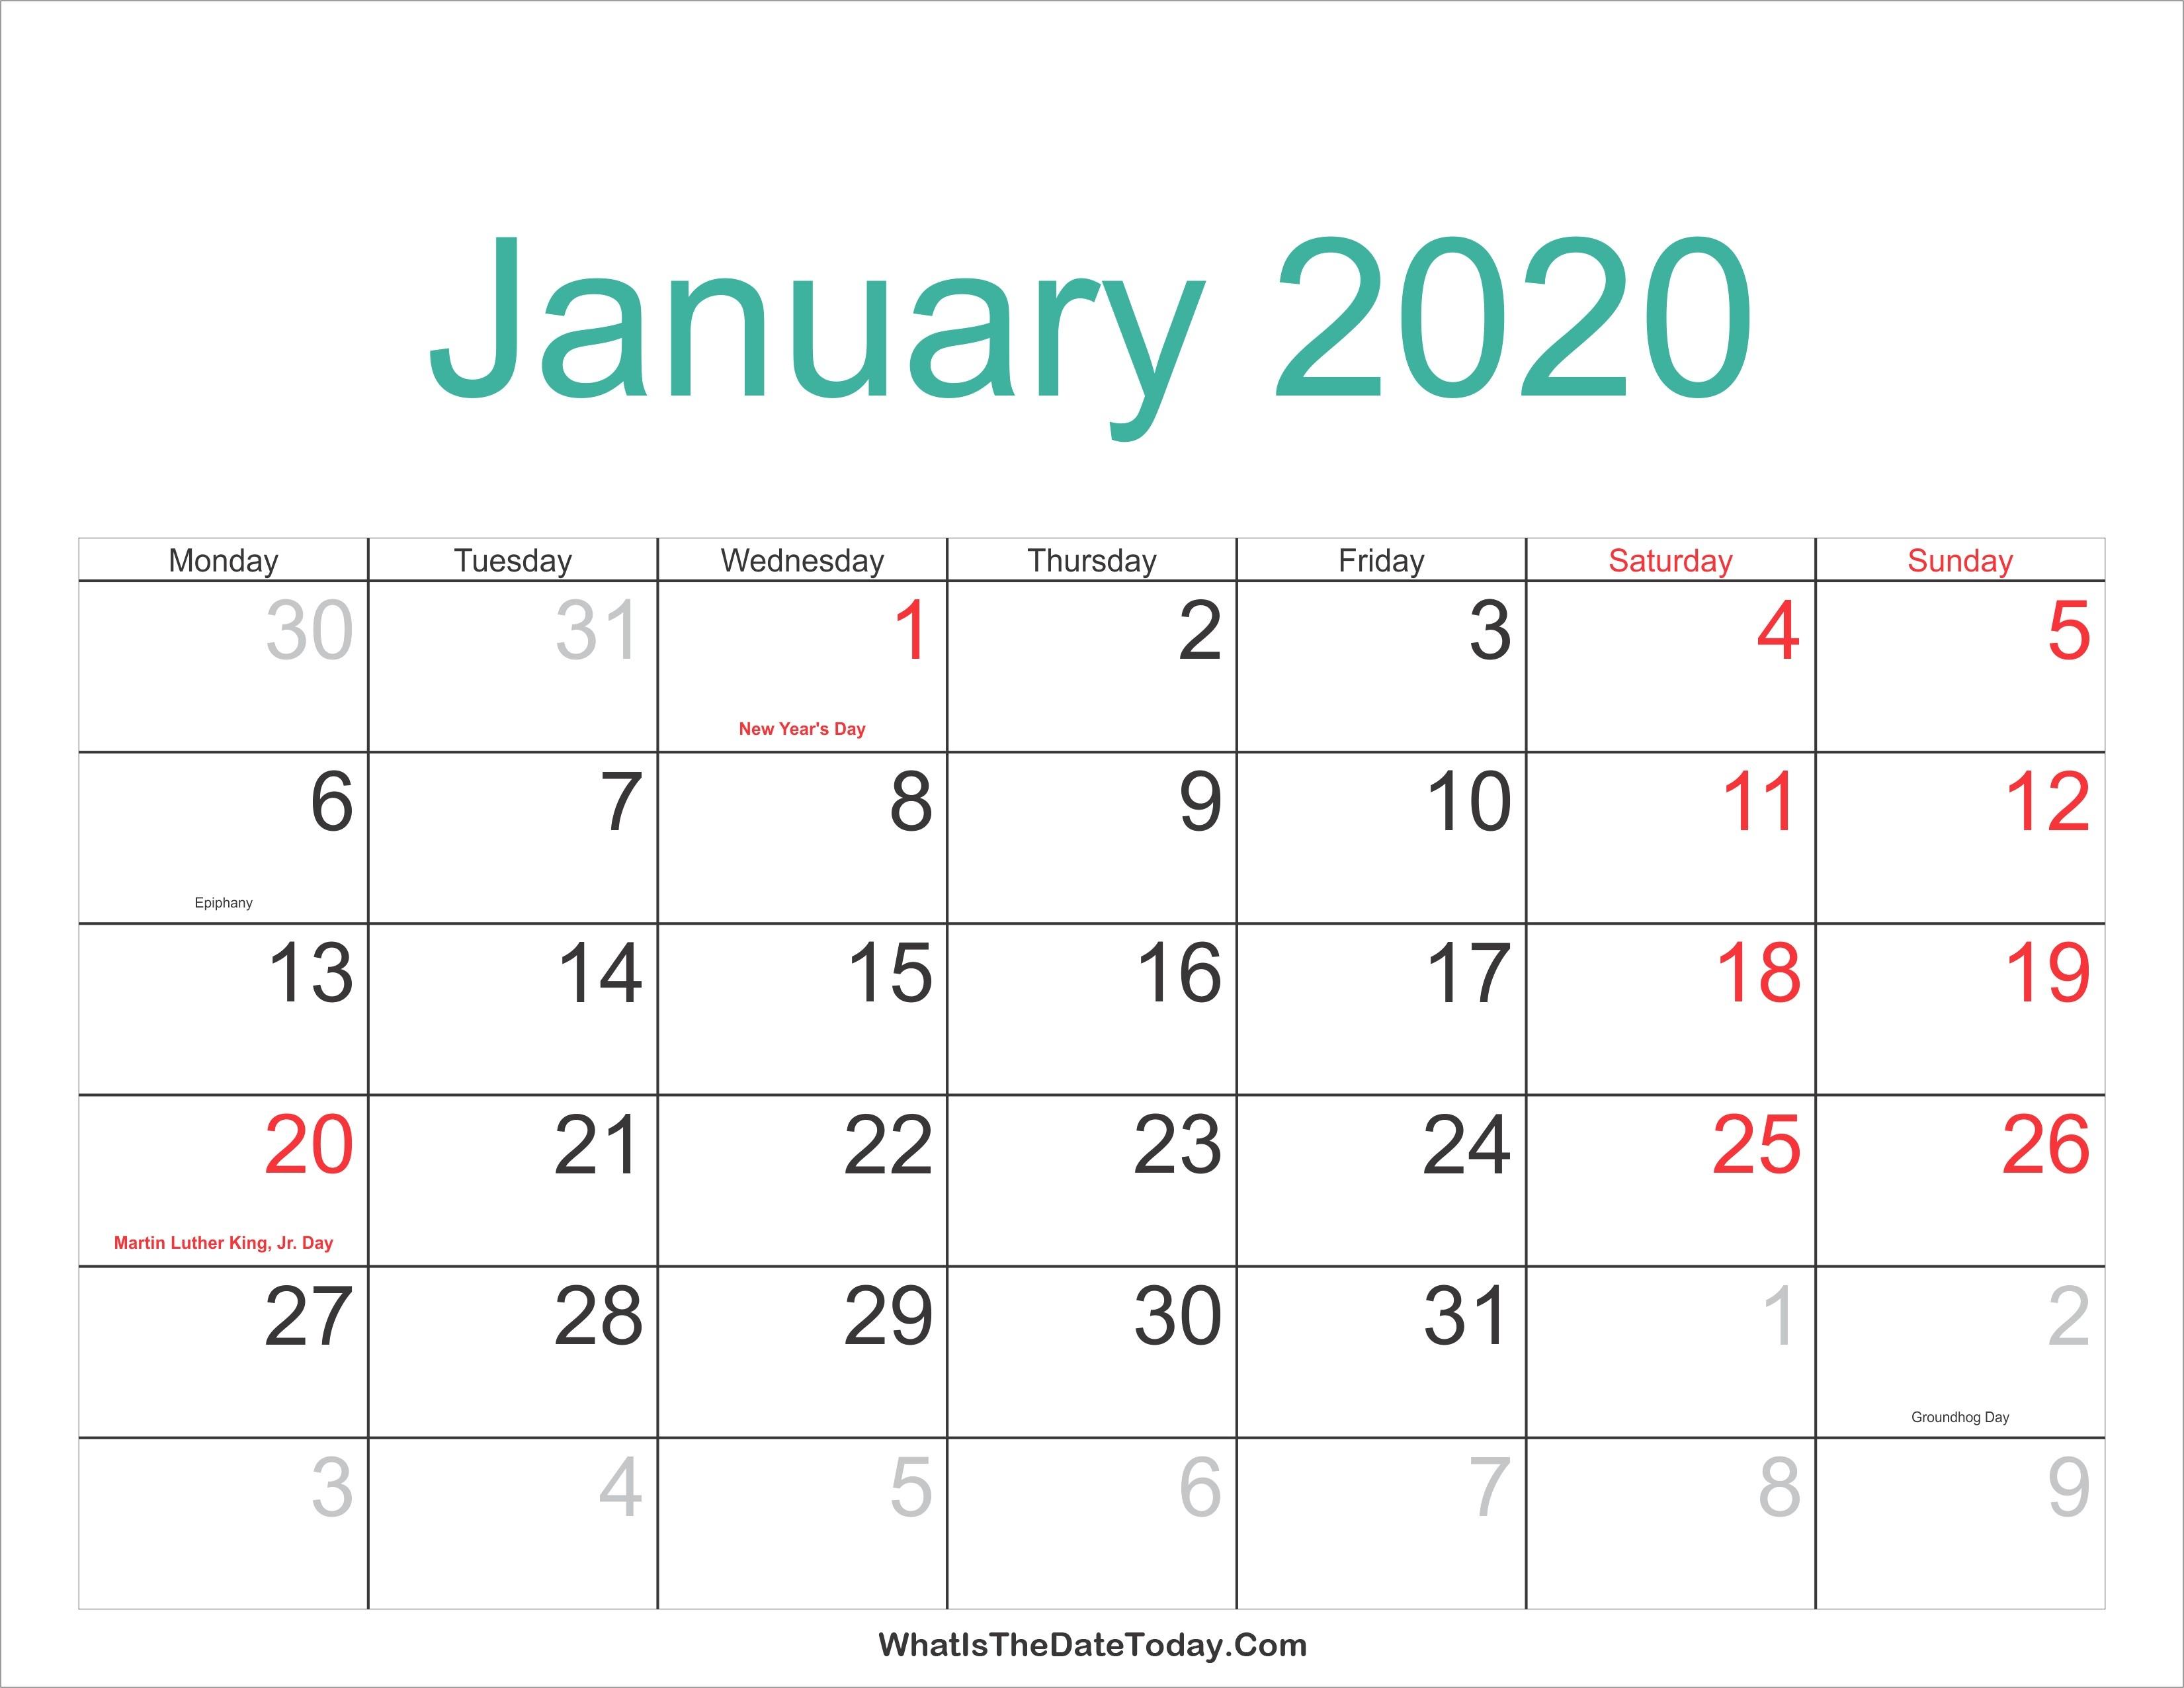 January 2020 Calendar Printable Holidays Full | Jcreview-January 2020 Calendar Philippines